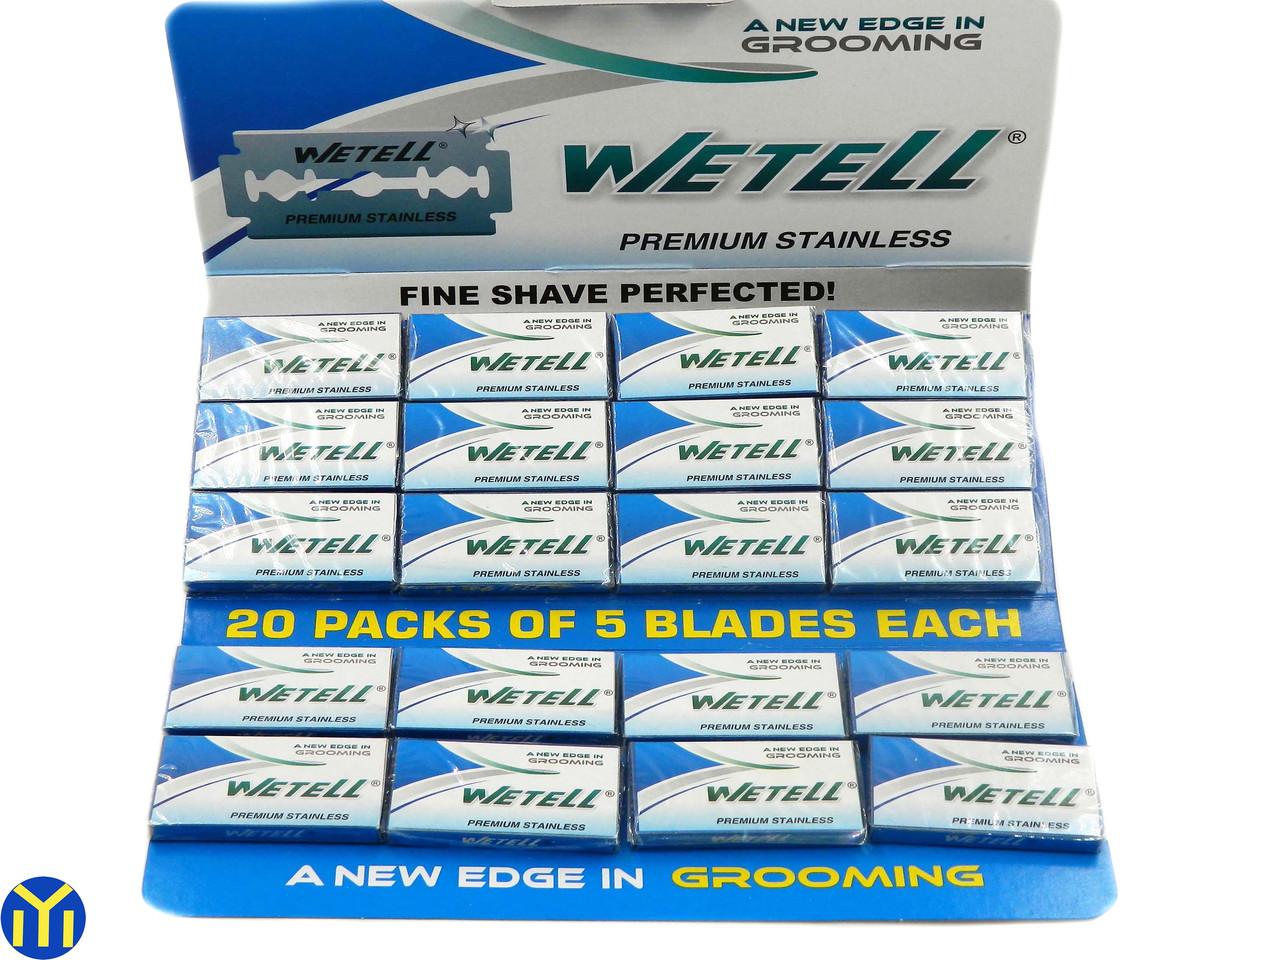 Лезвия Wetell, Premium Stainless